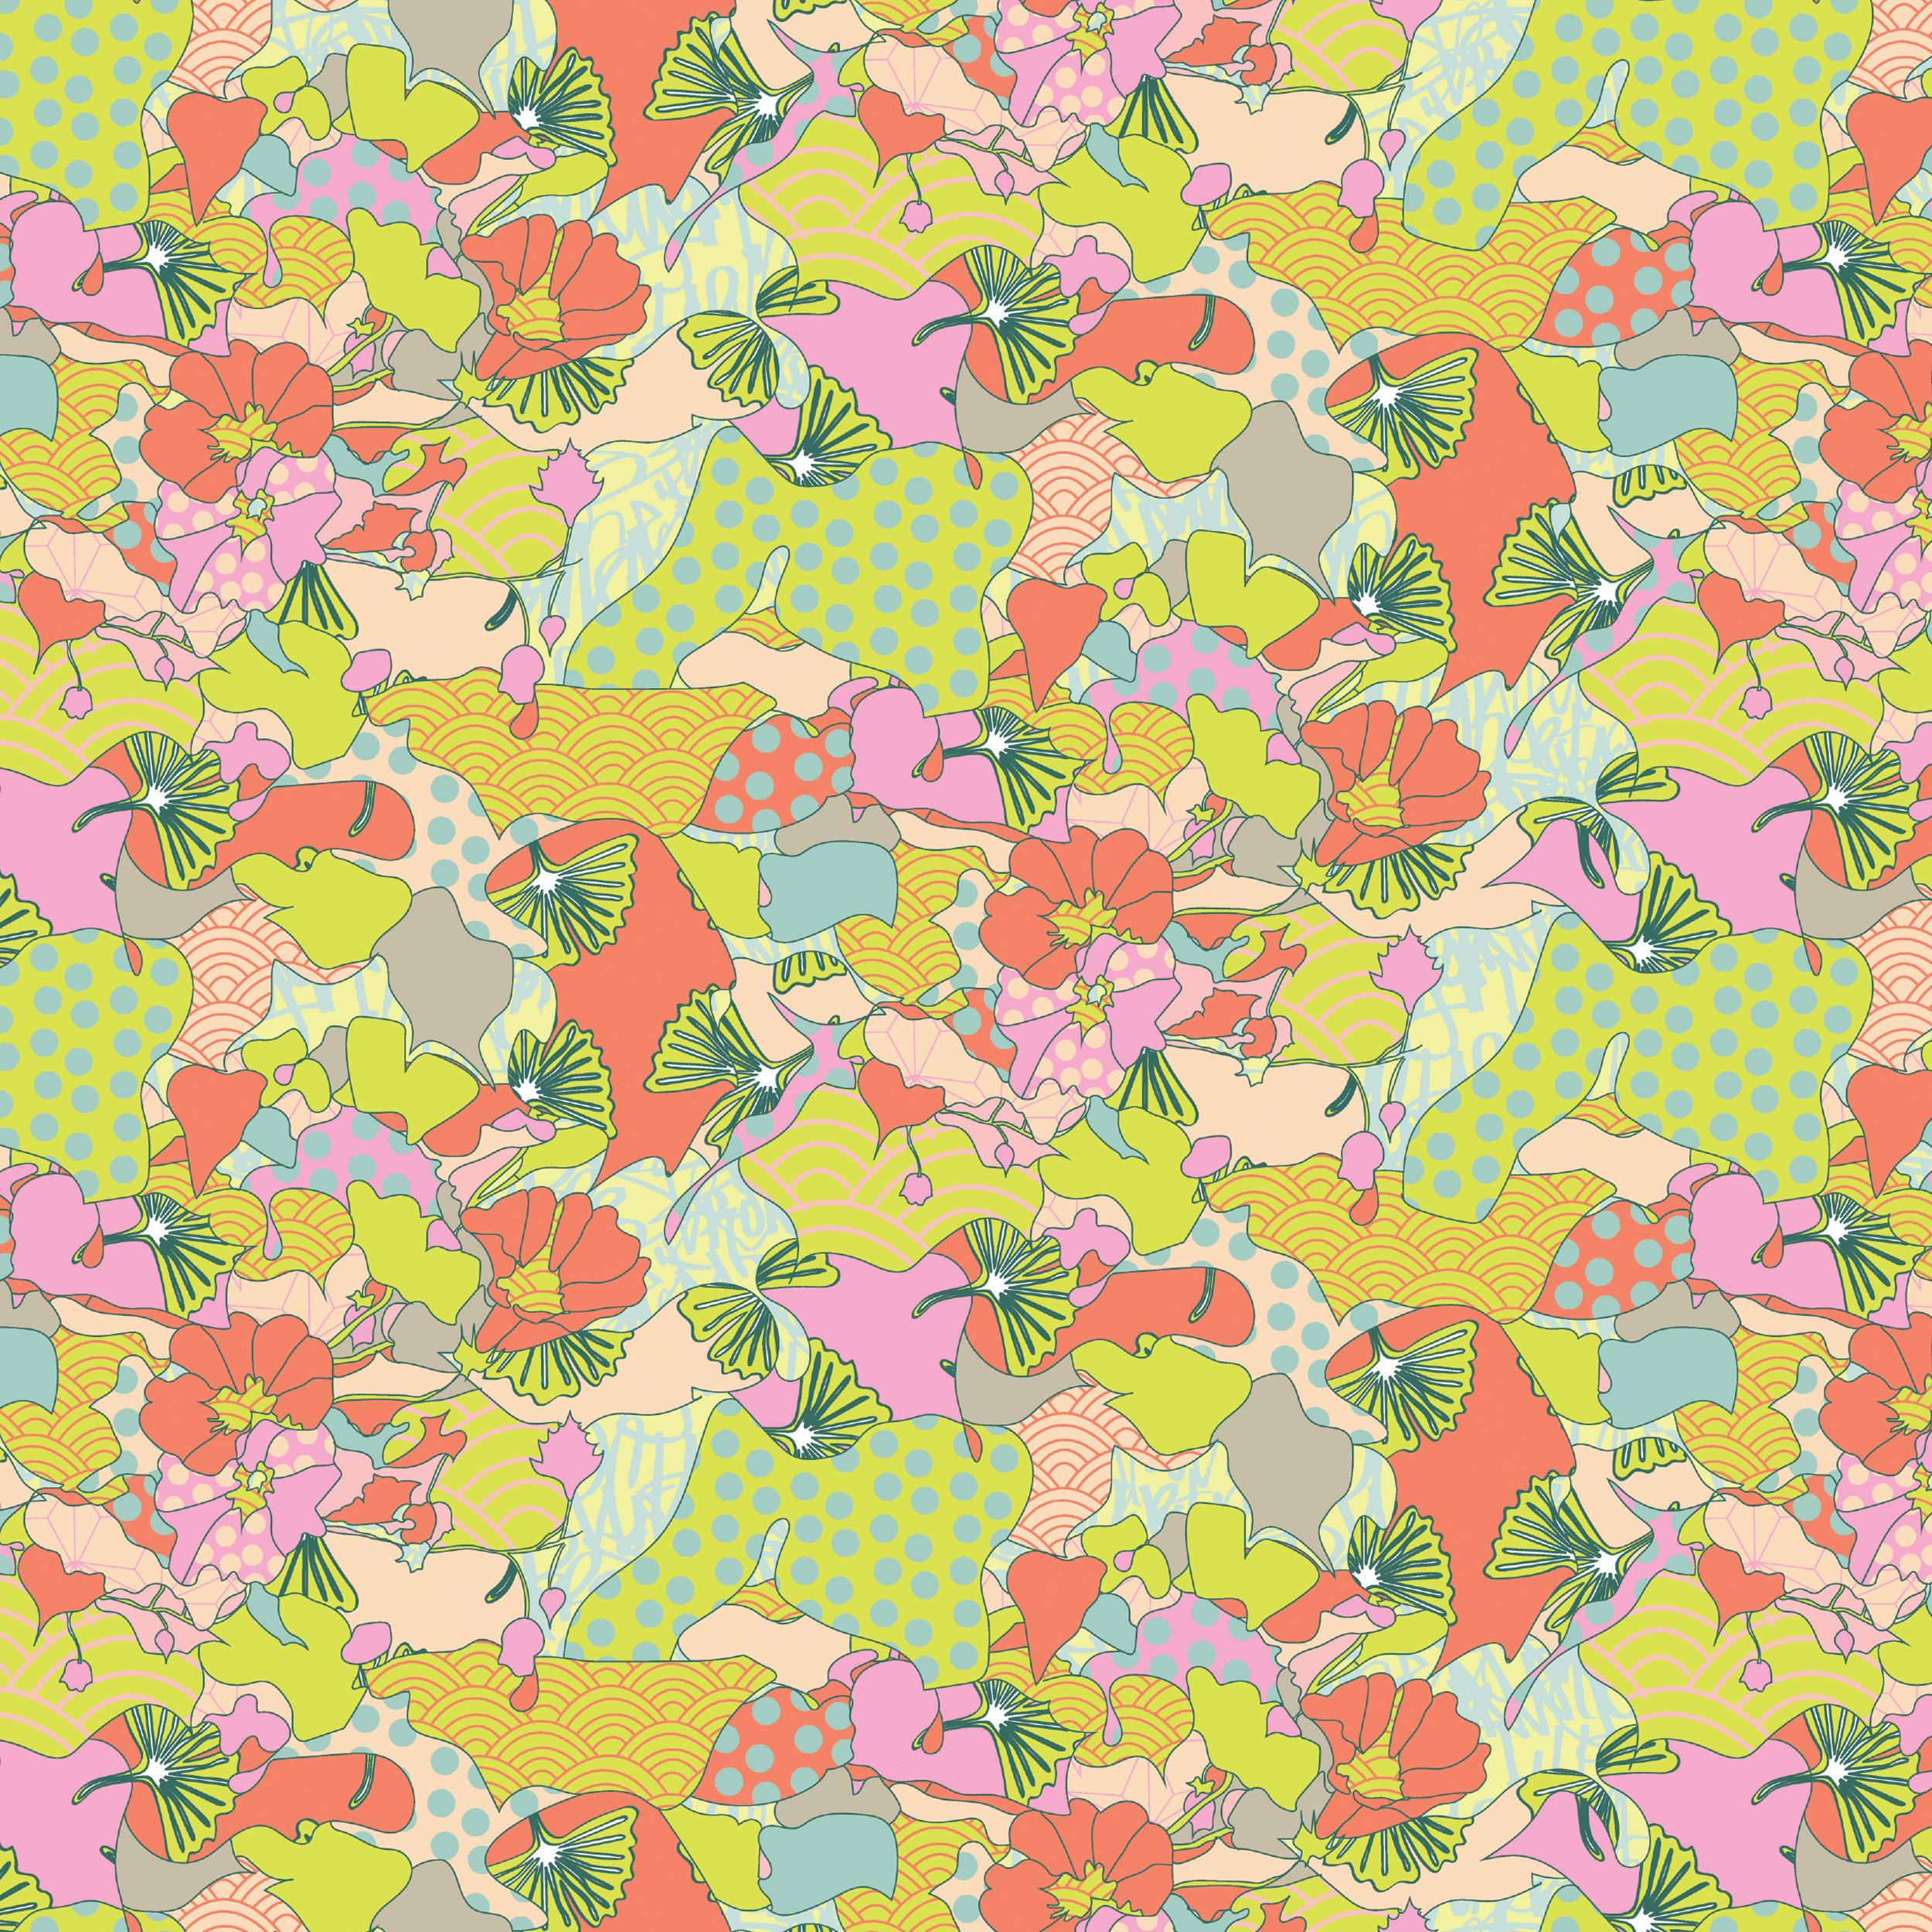 Maxamamilism soul | Digitally drawn patterns in patterns.